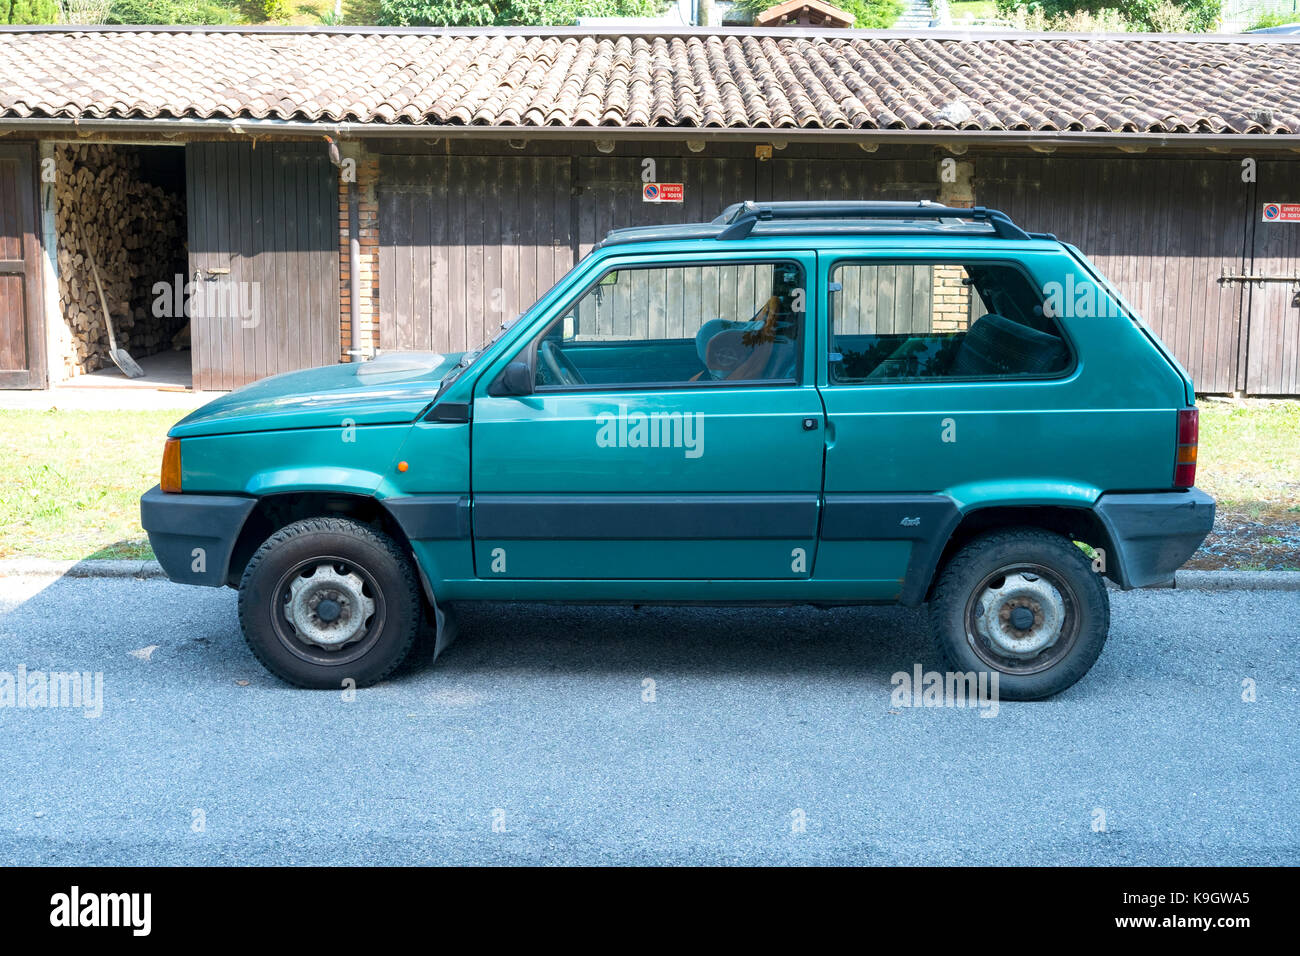 sale classic glorious vs cross mud for swift auto twin suzuki express fiat panda